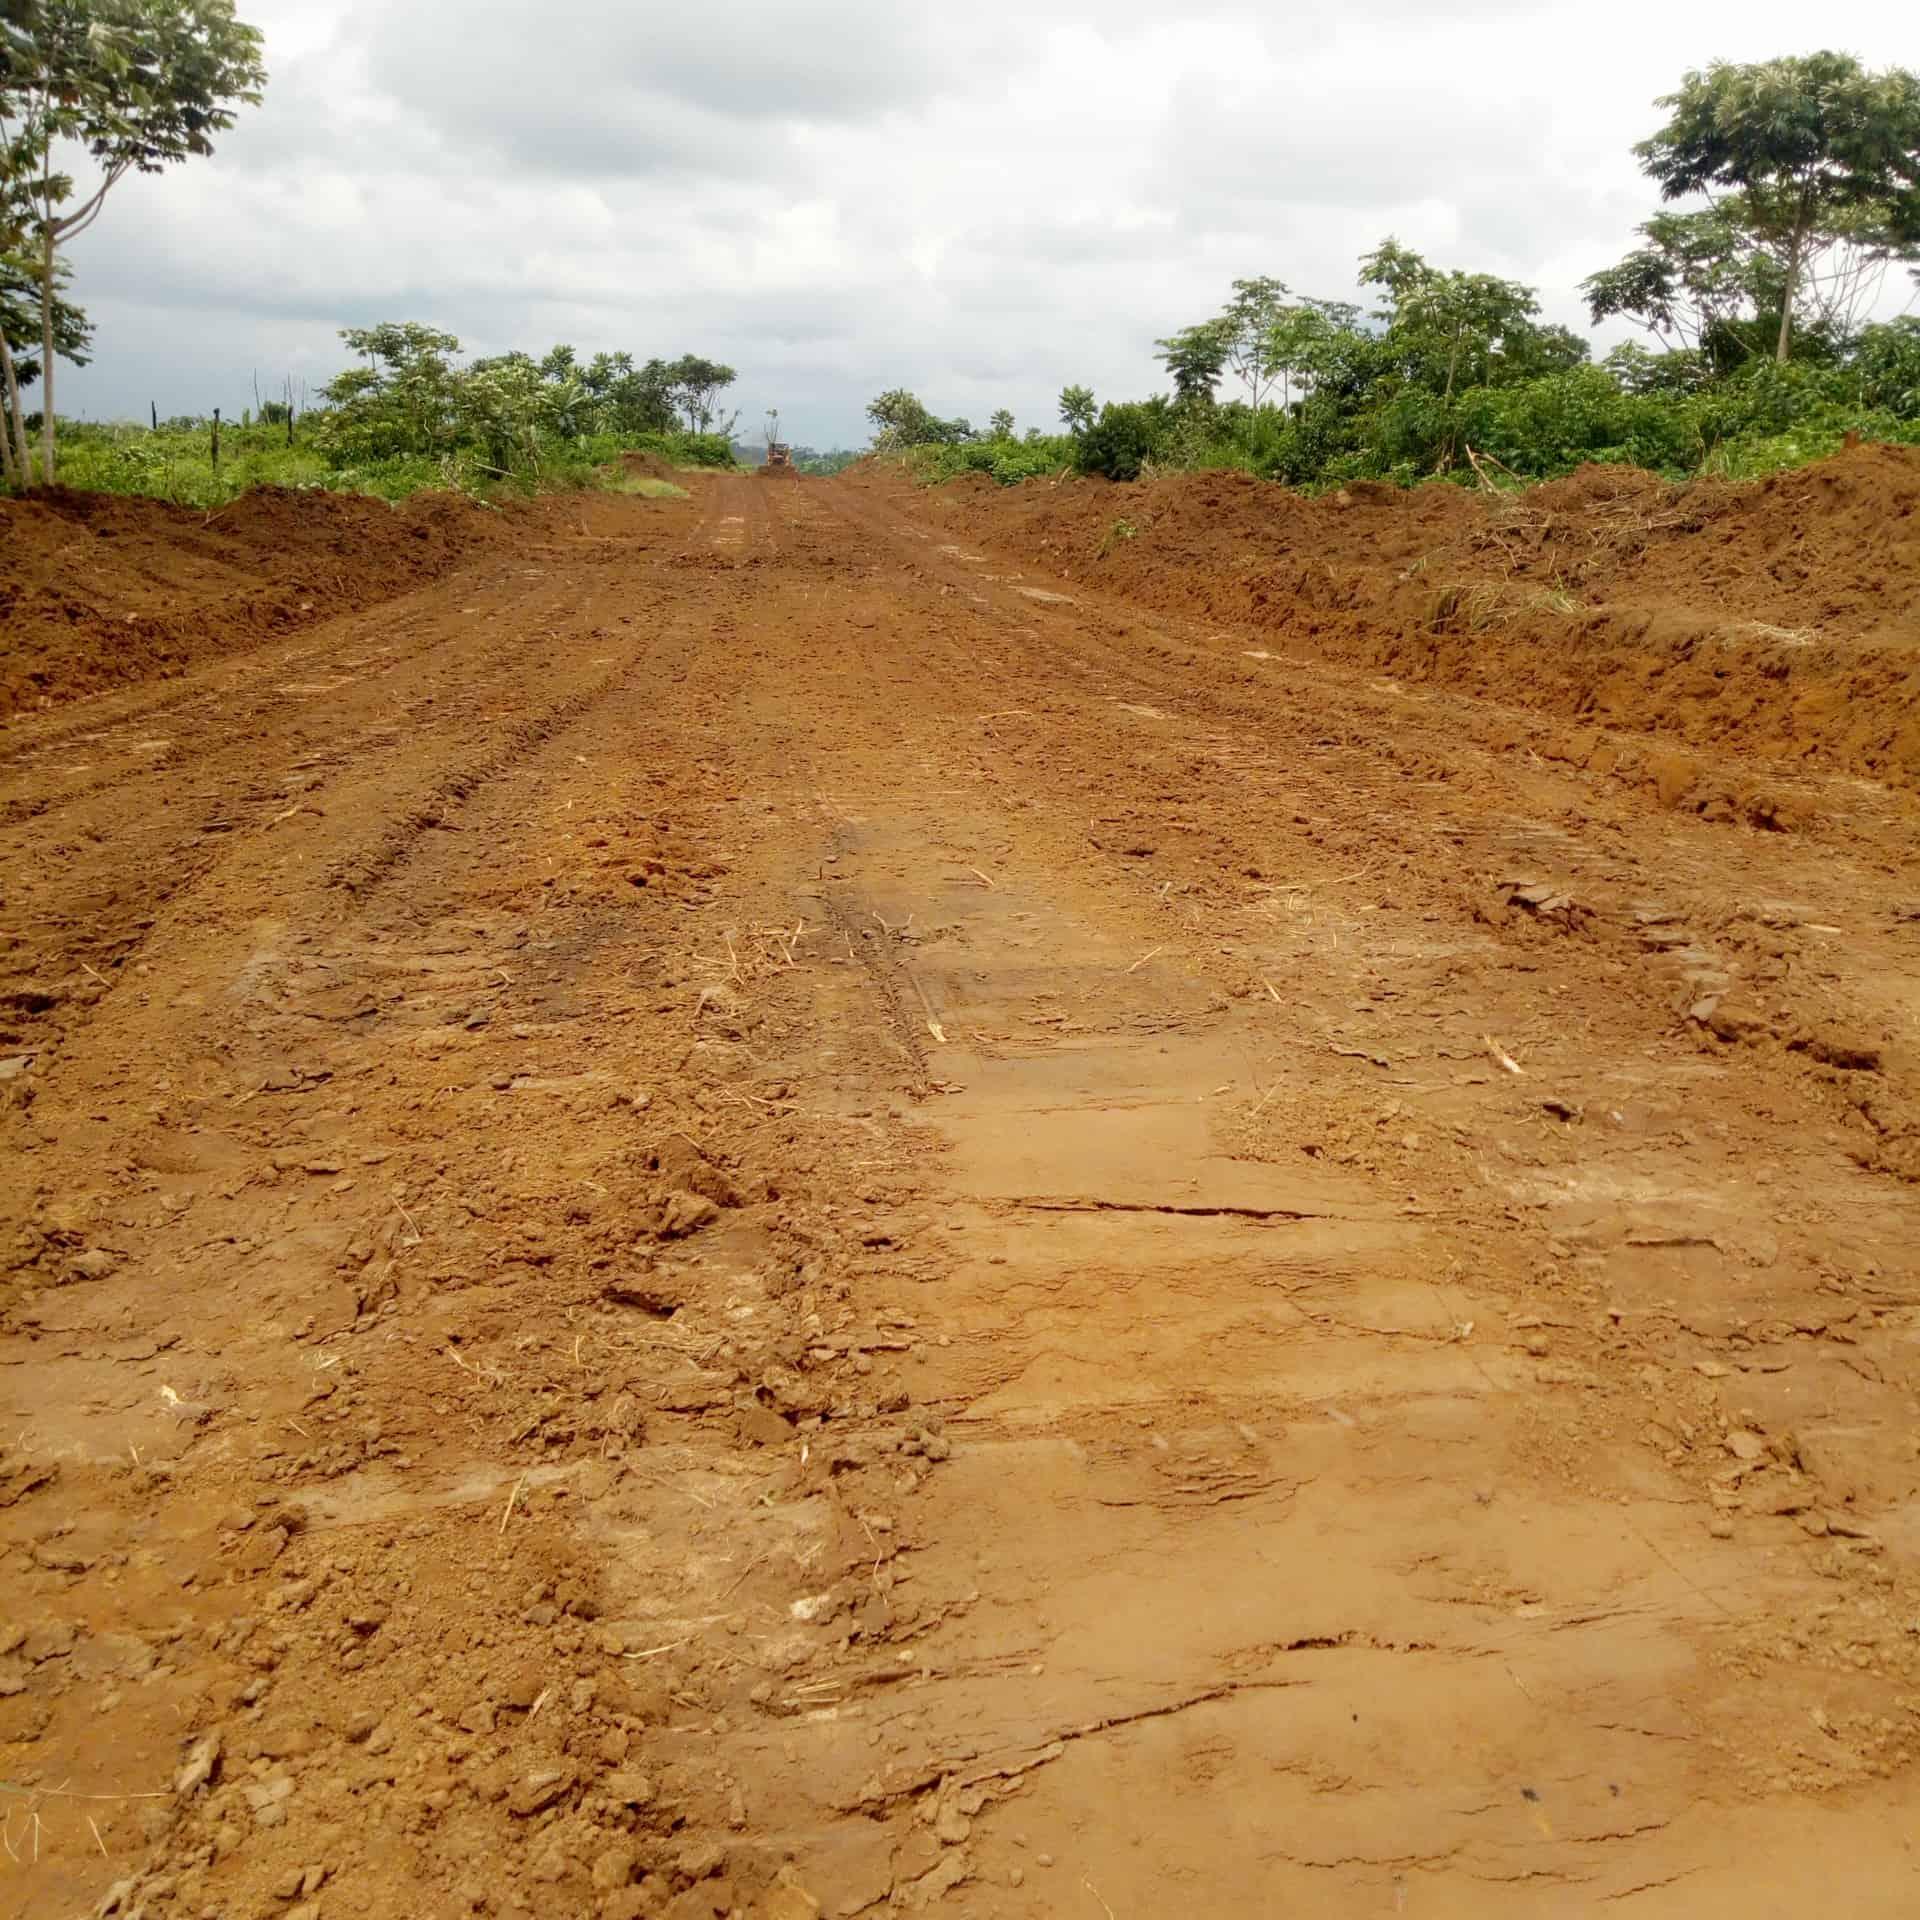 Land for sale at Yaoundé, Afanoyoa II, centre - 500 m2 - 7 500 000 FCFA